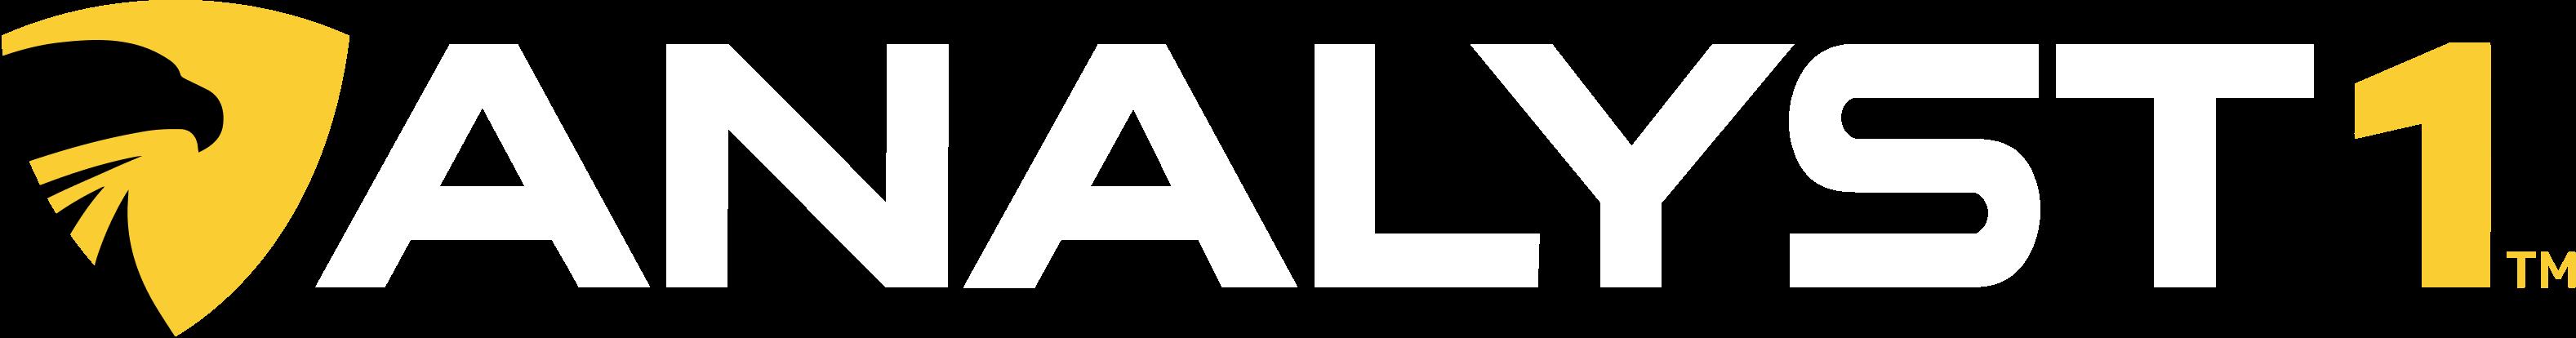 Analyst1 Brand Identity - Reversed